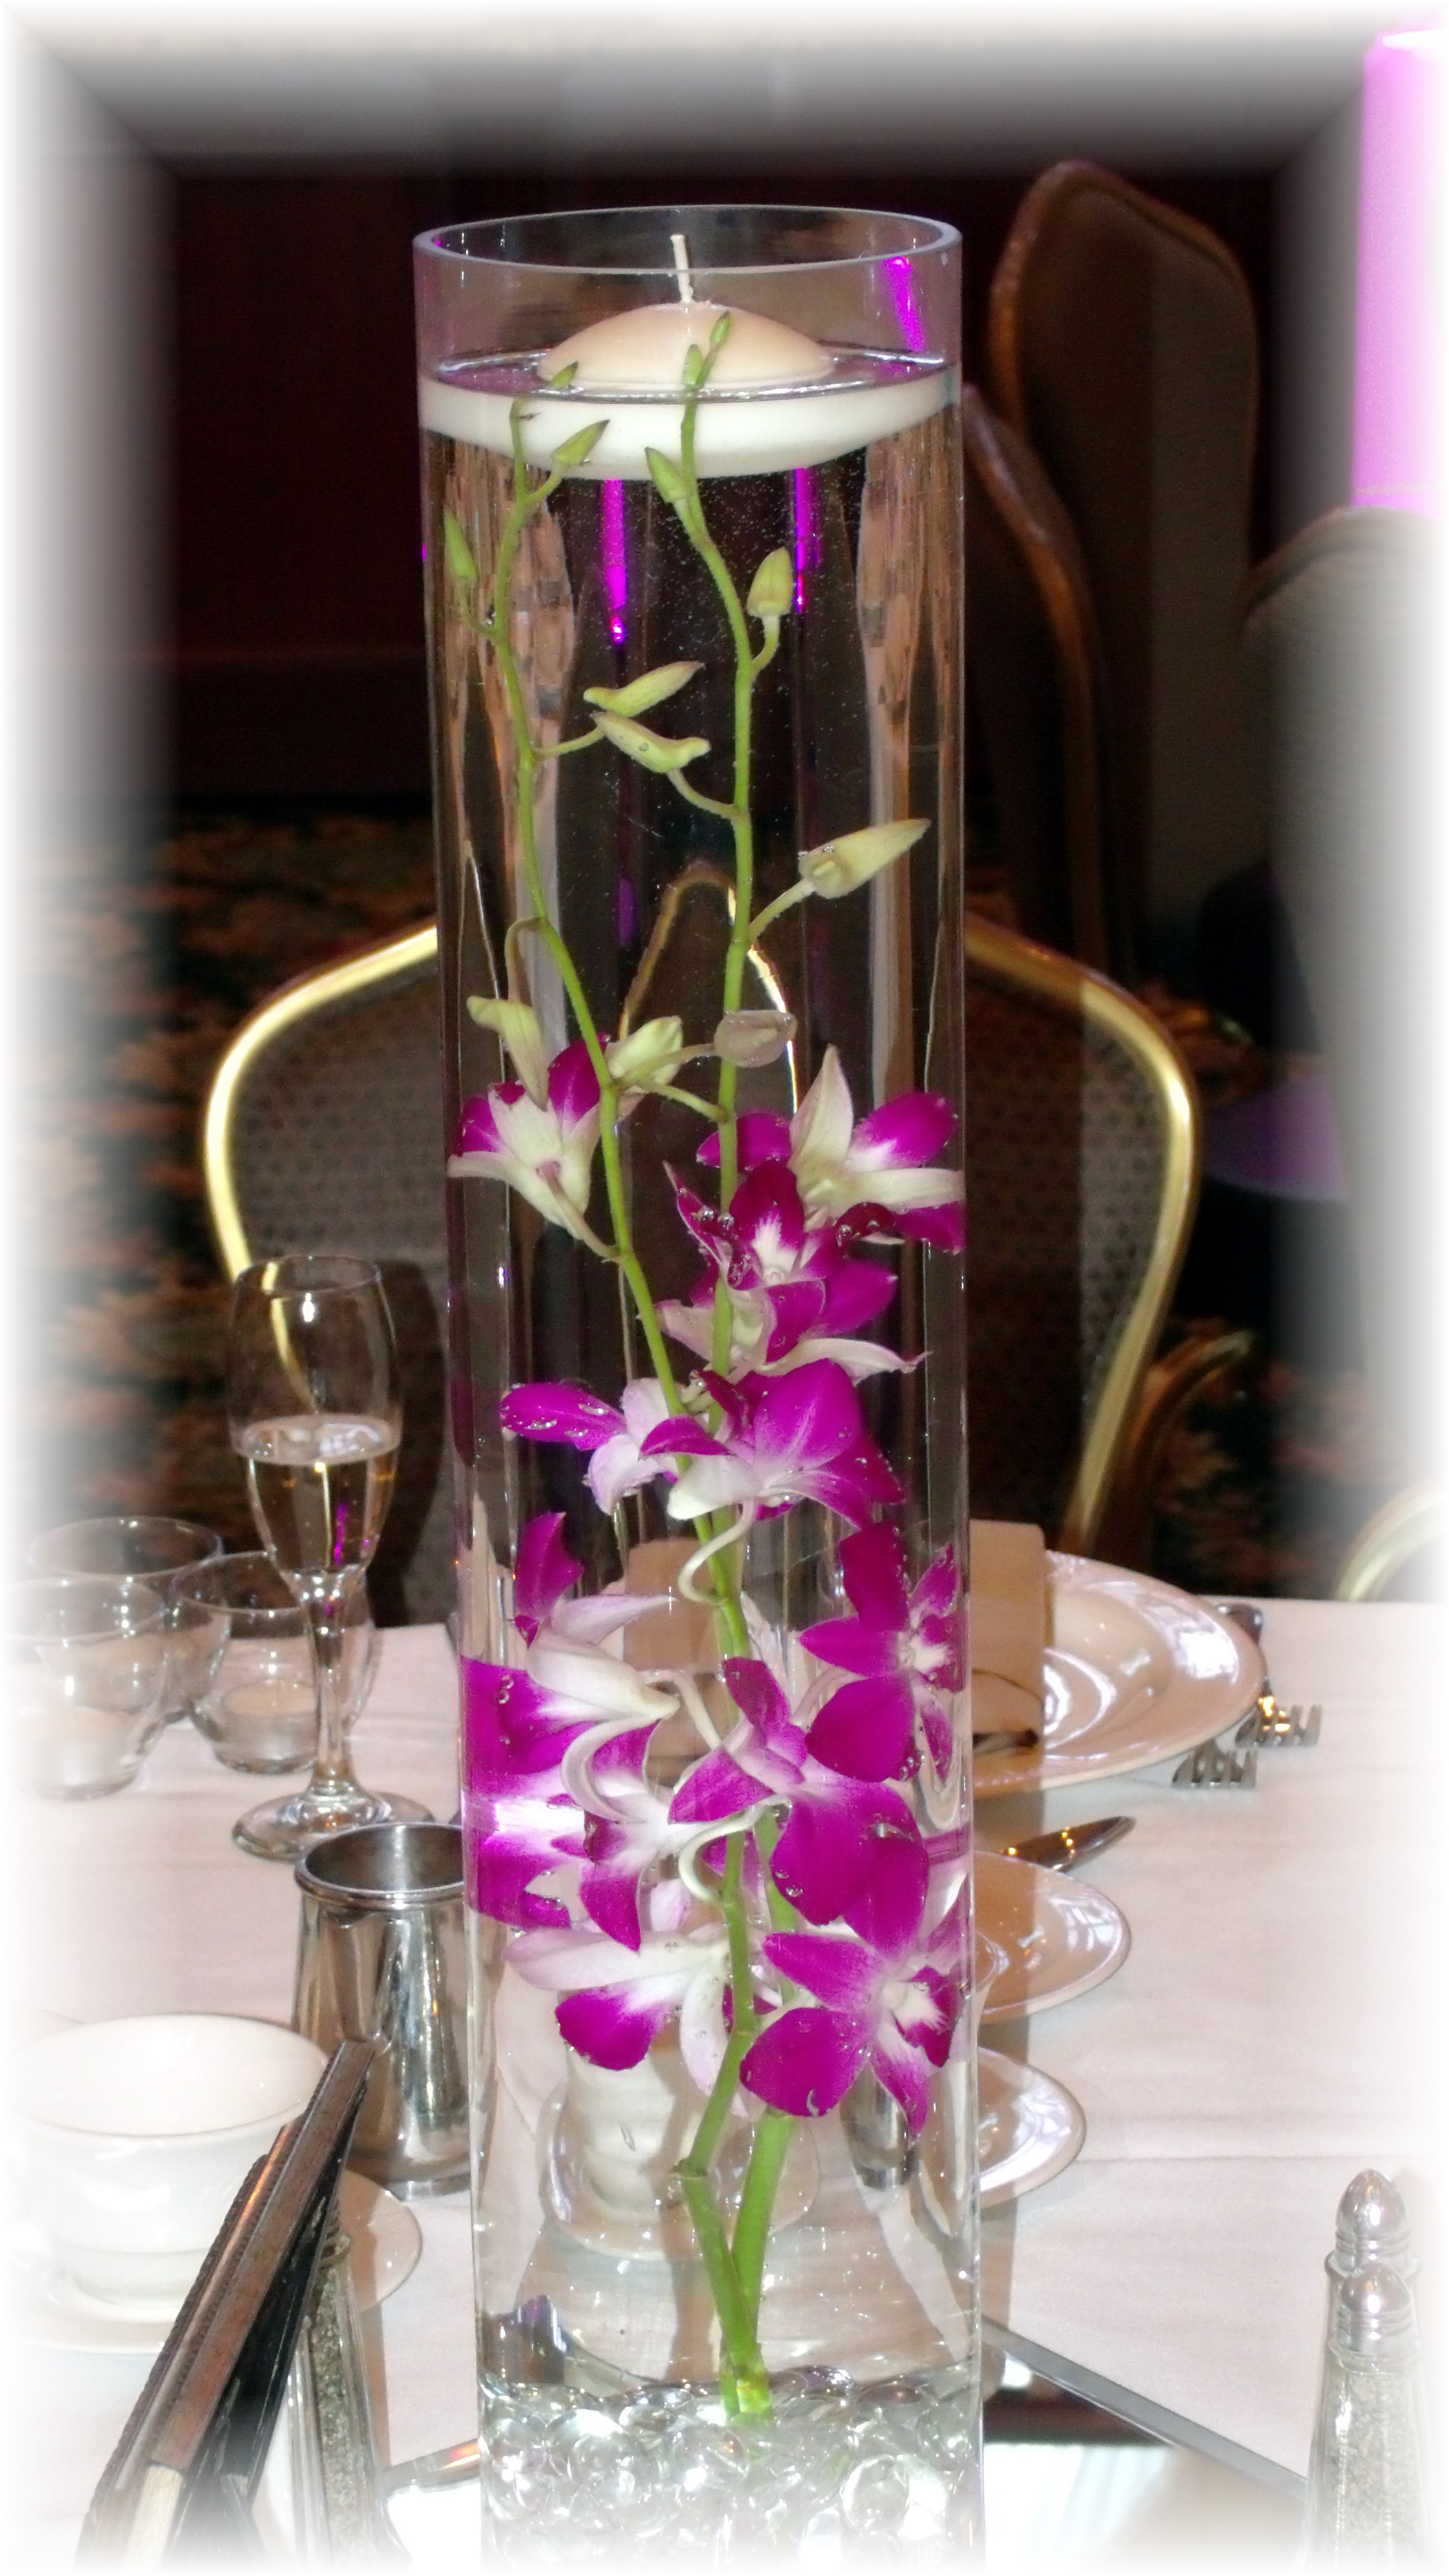 Submerged orchids Centerpiece